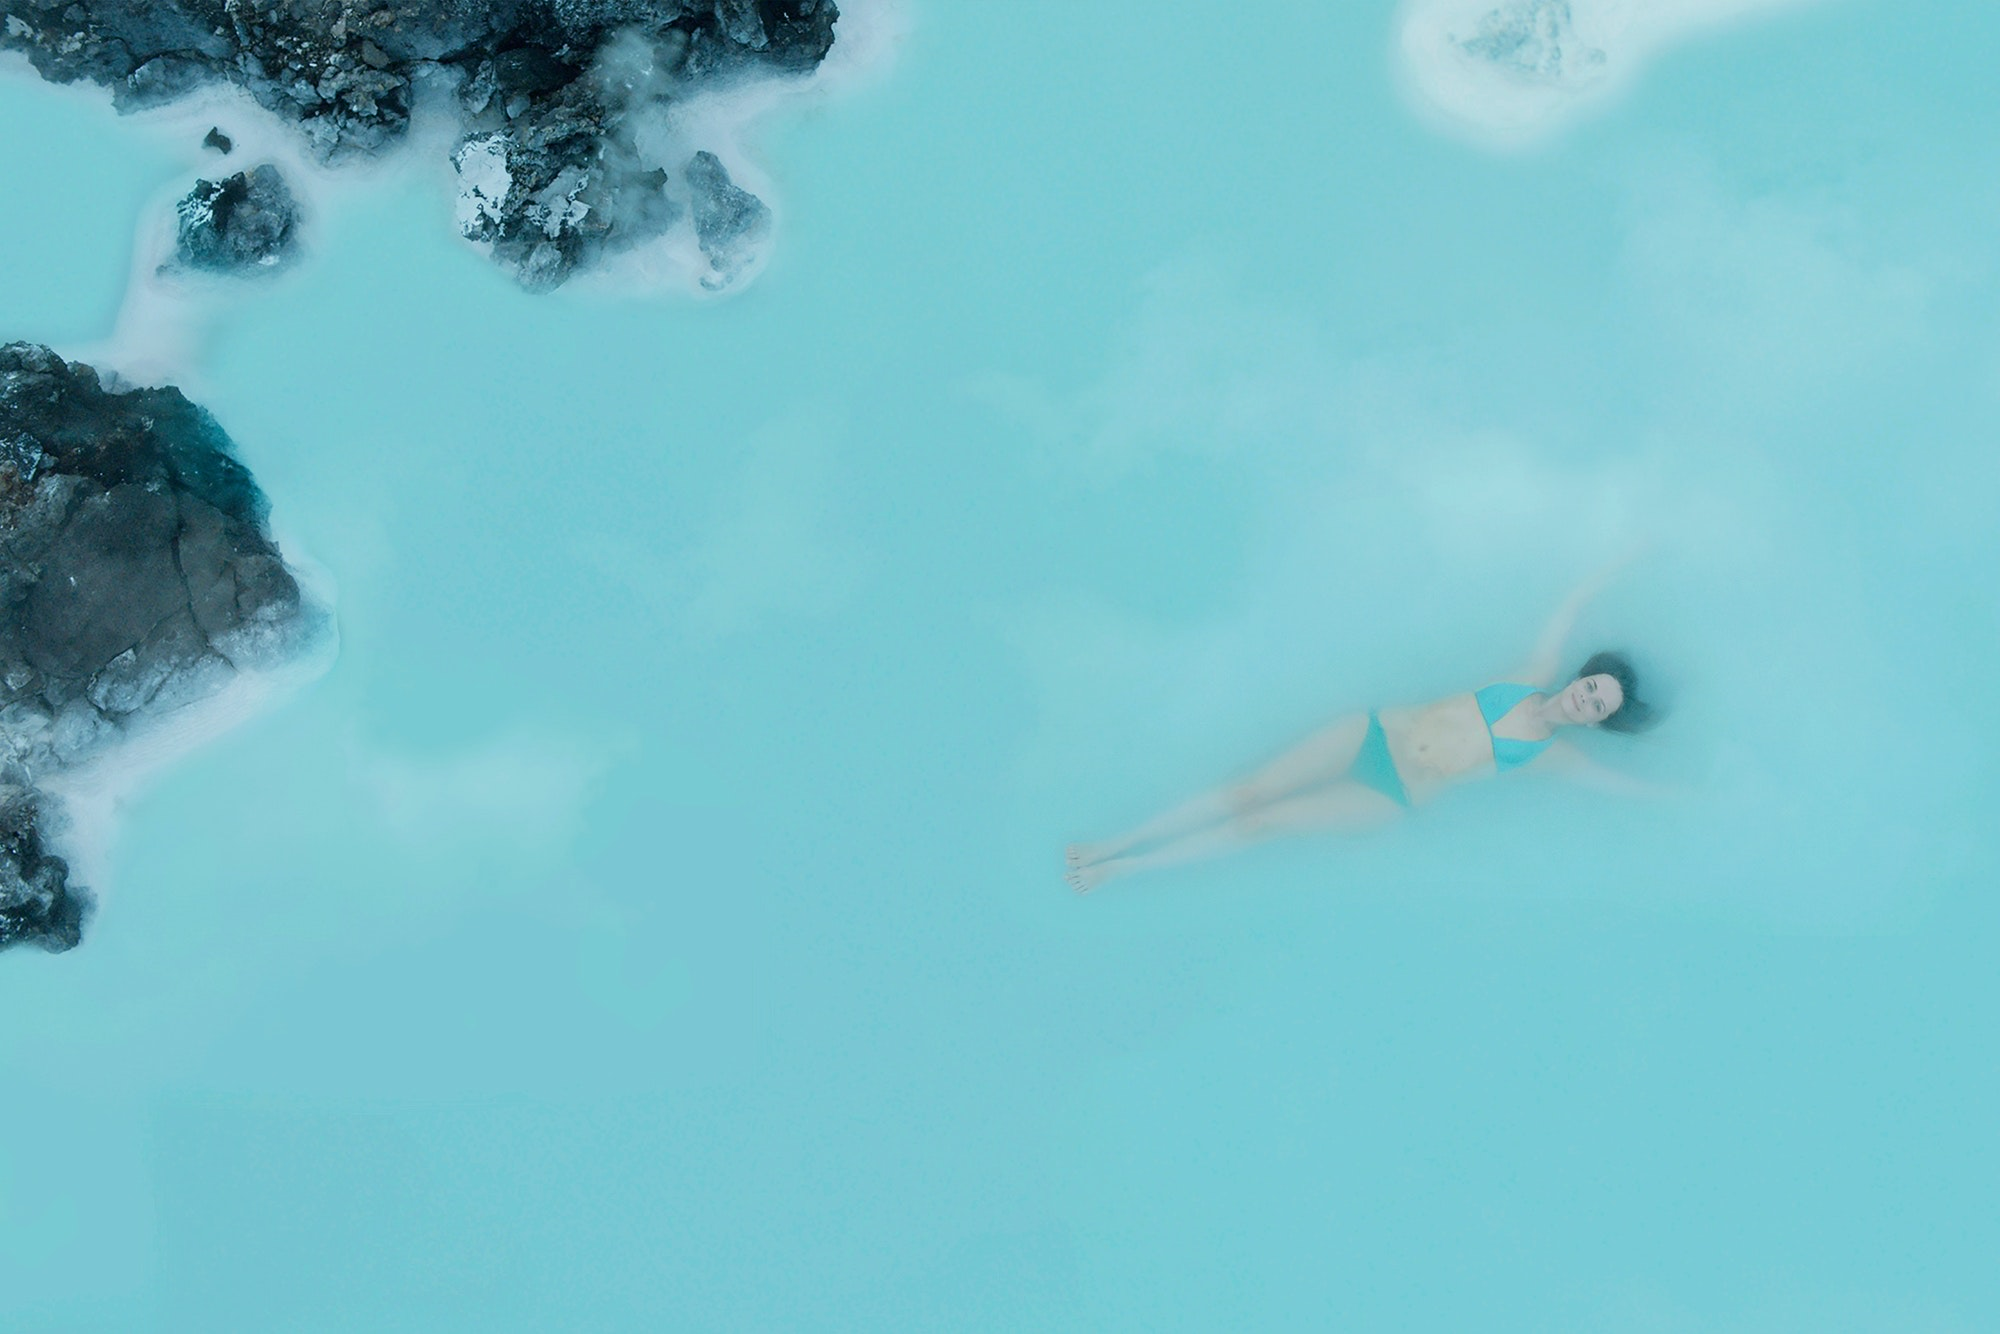 Blue Lagoon en Islande | Guide complet du Lagon Bleu